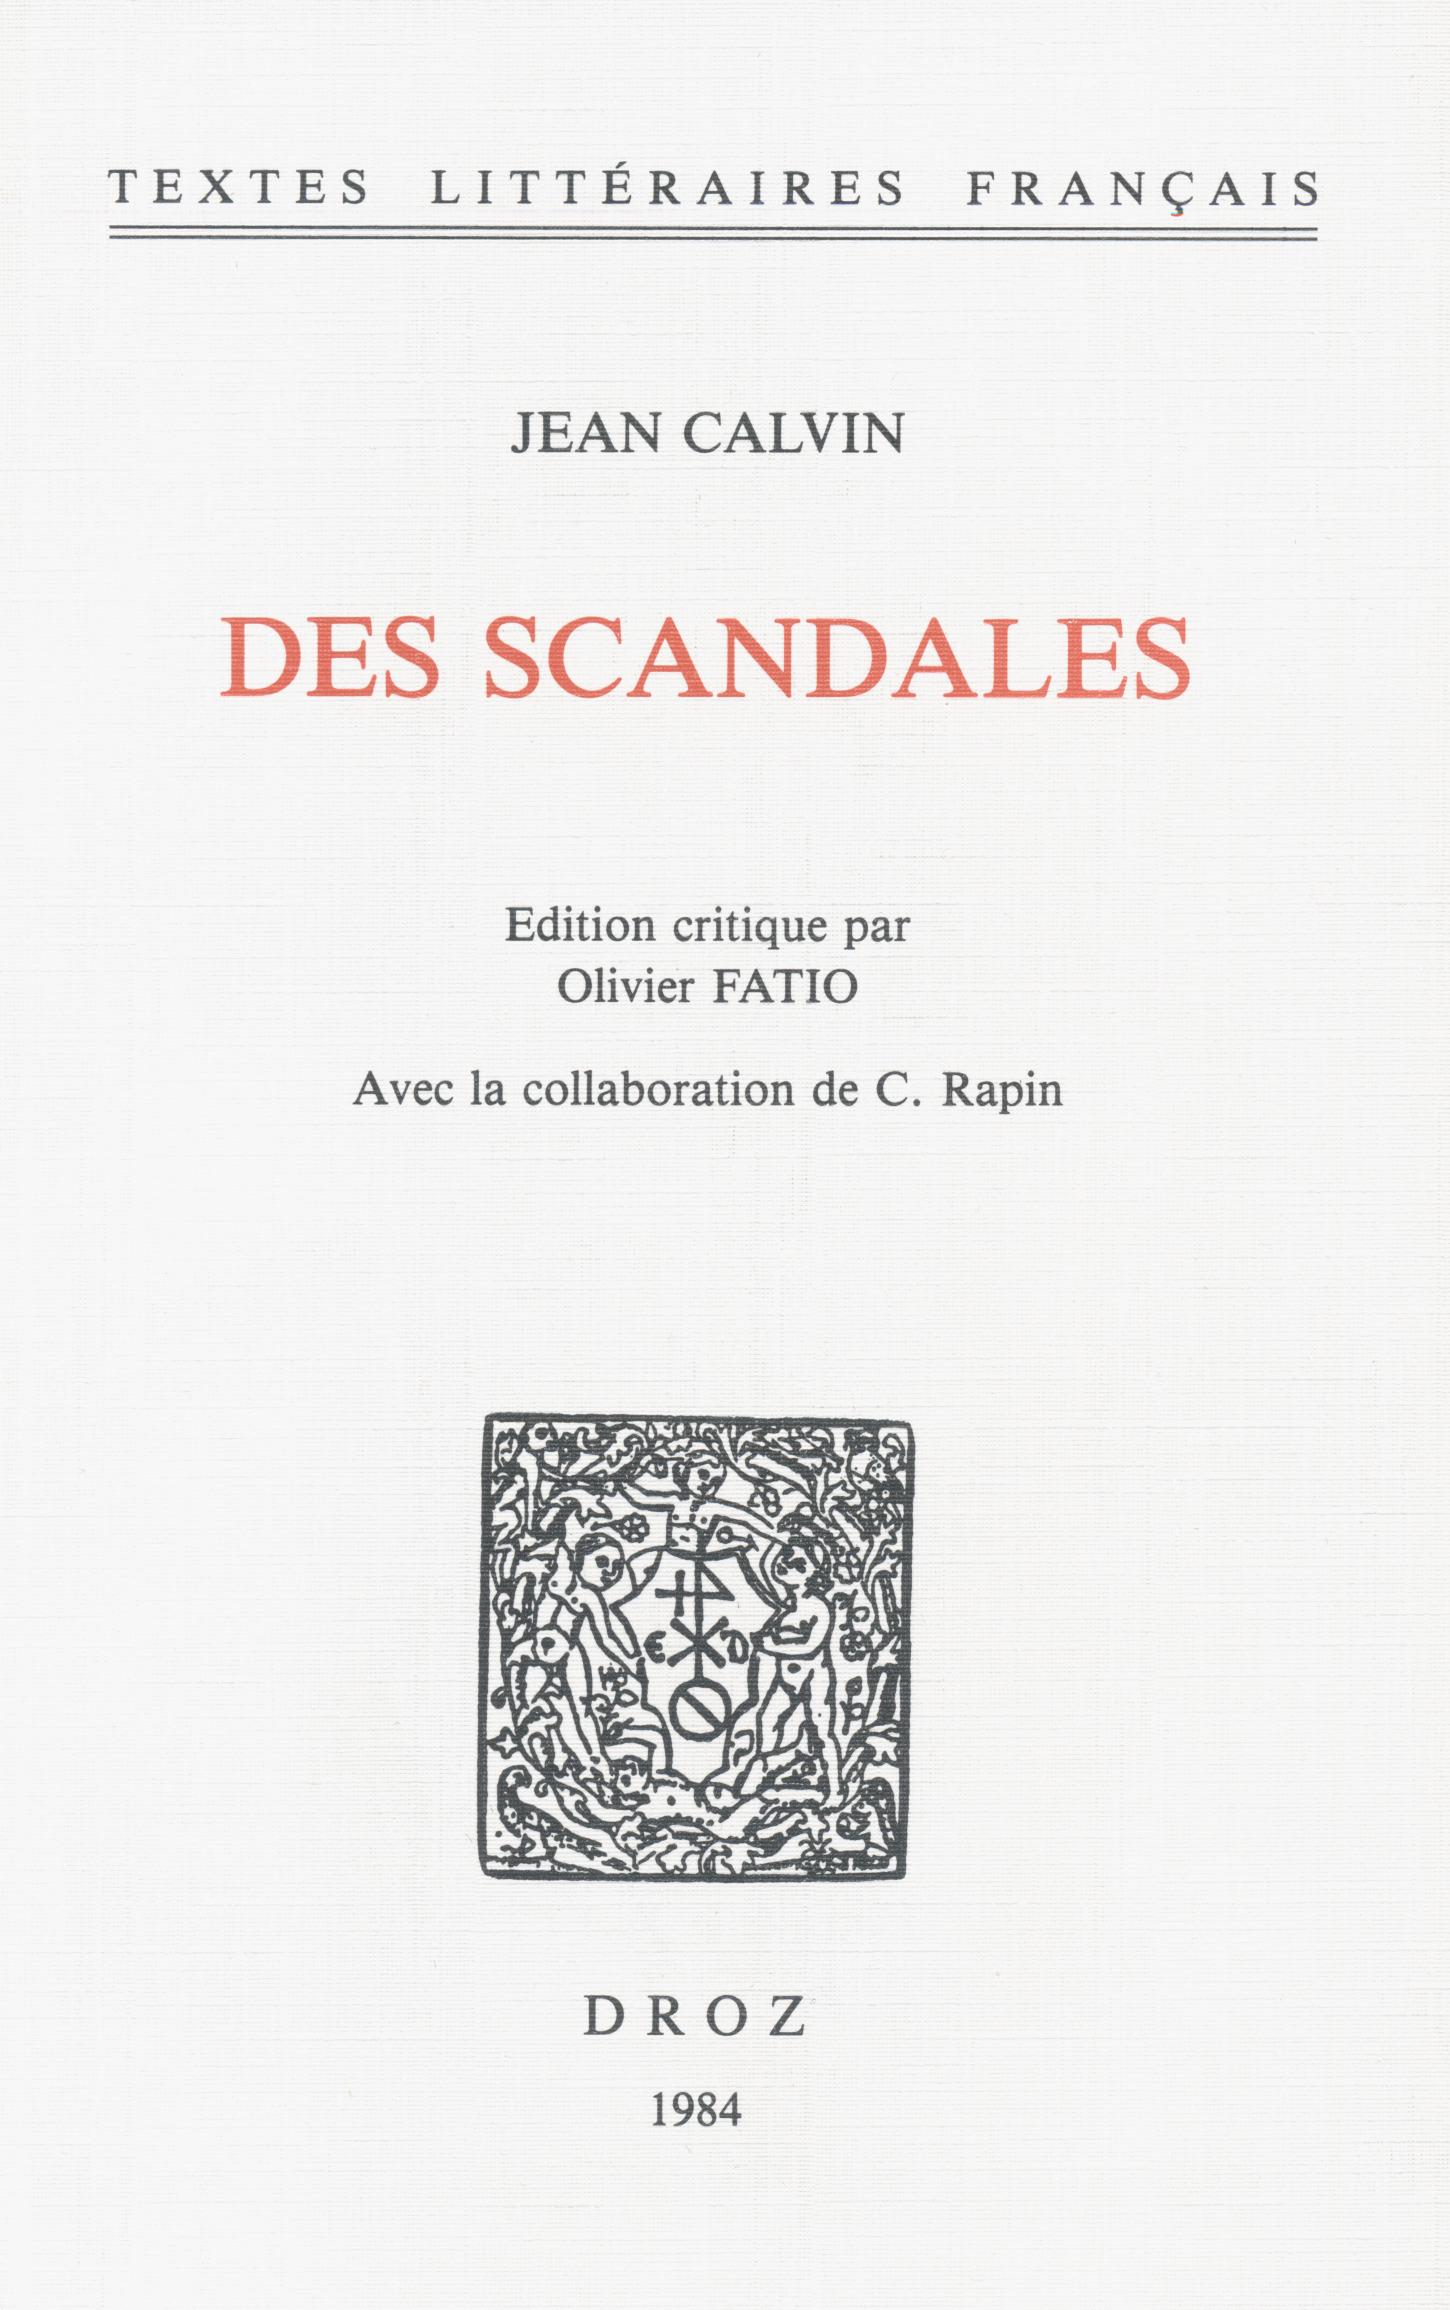 Des Scandales  - Jean Calvin  - C. Rapin